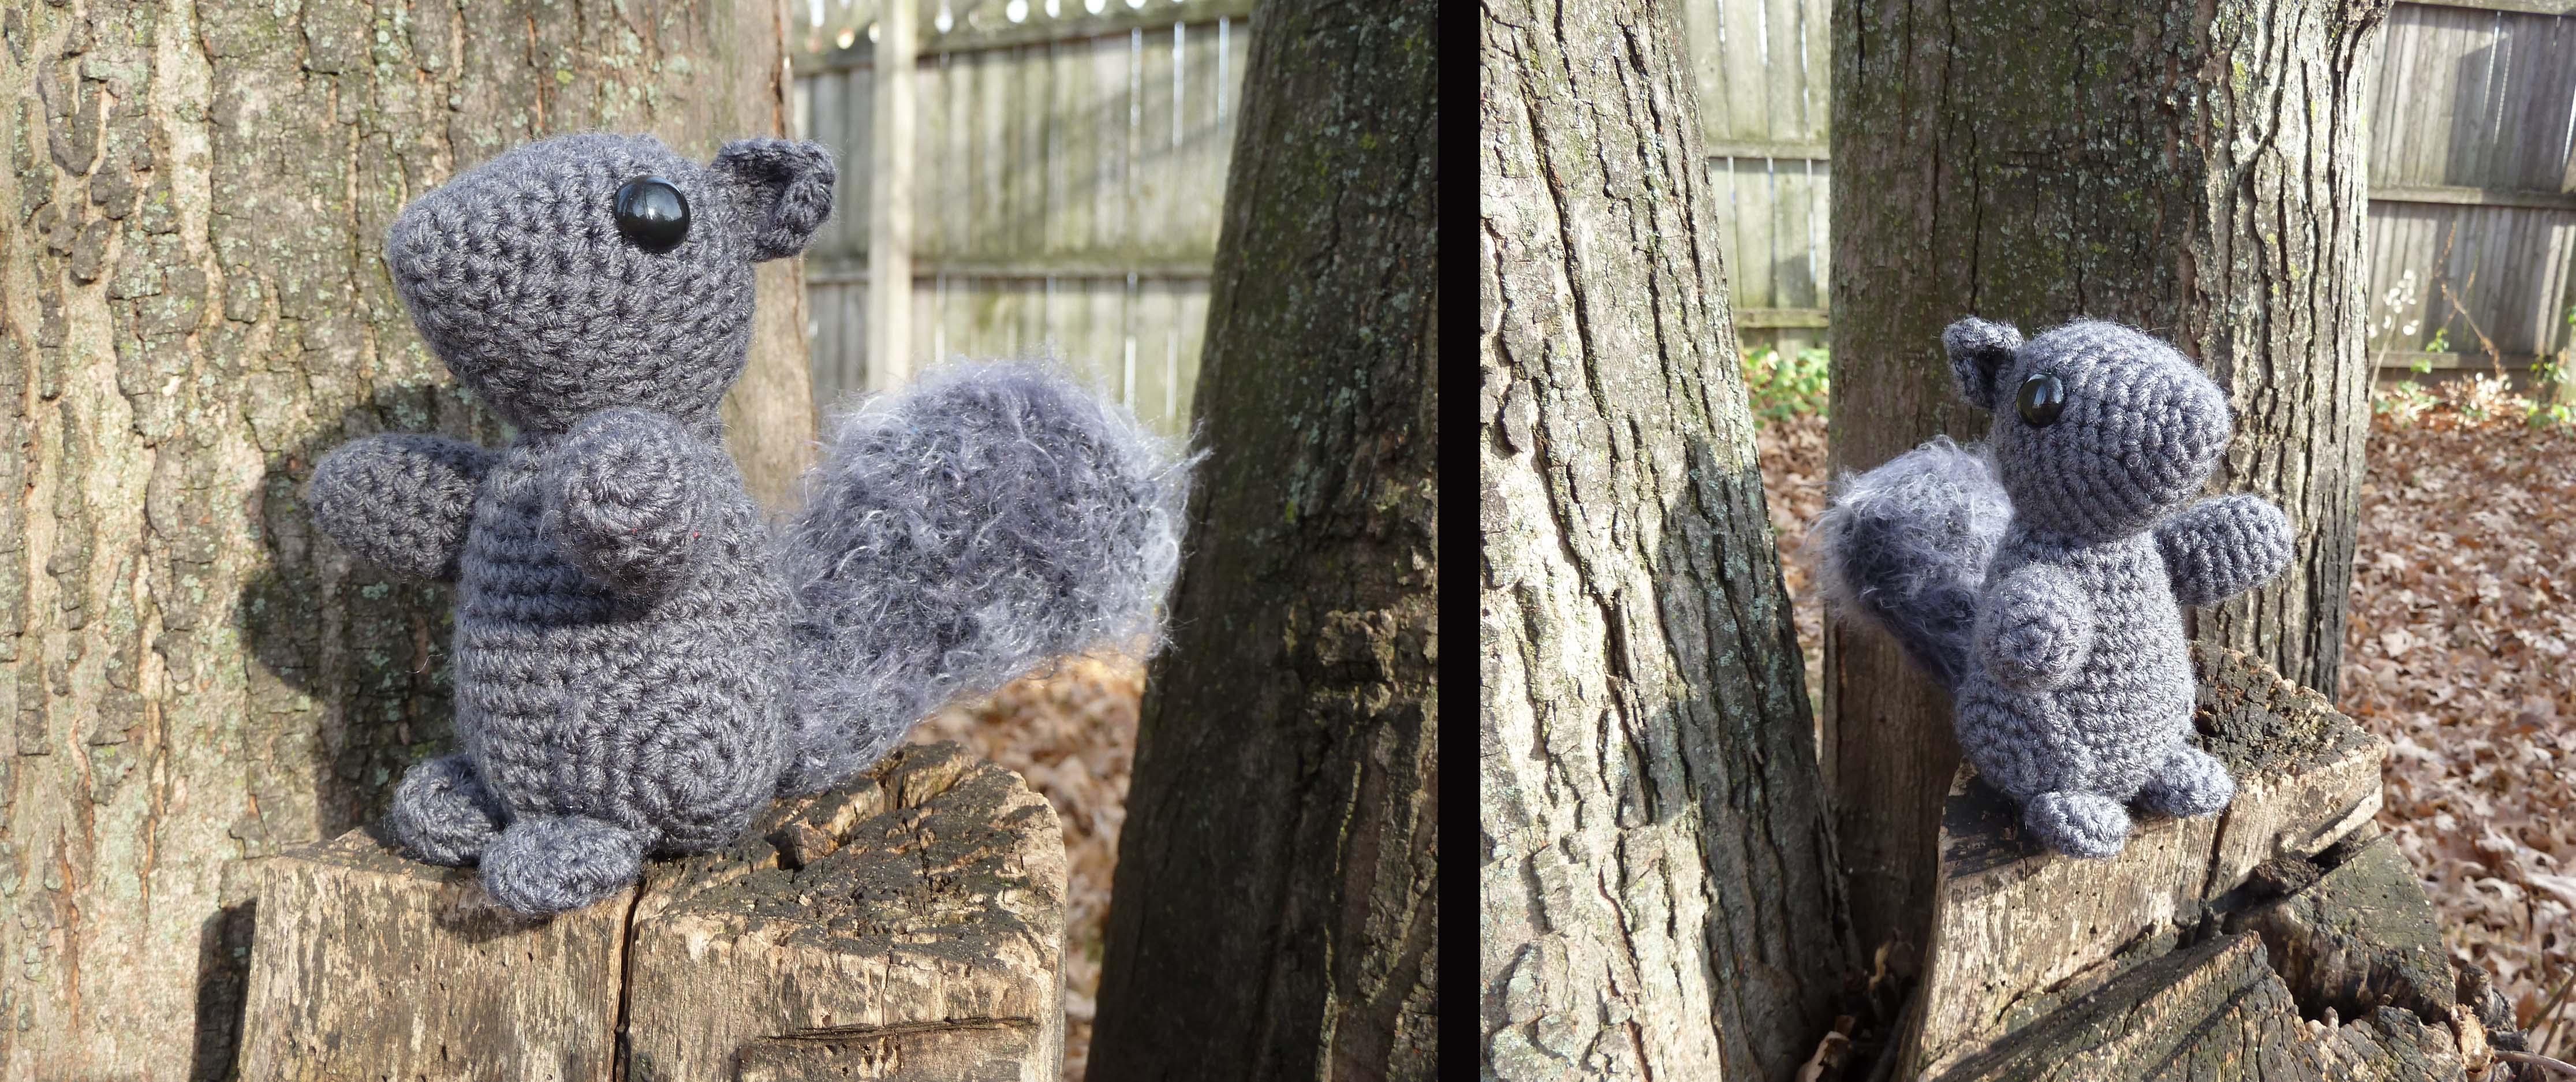 Amigurumi Squirrel Crochet Pattern : Squirrel Amigurumi by bandotaku on DeviantArt